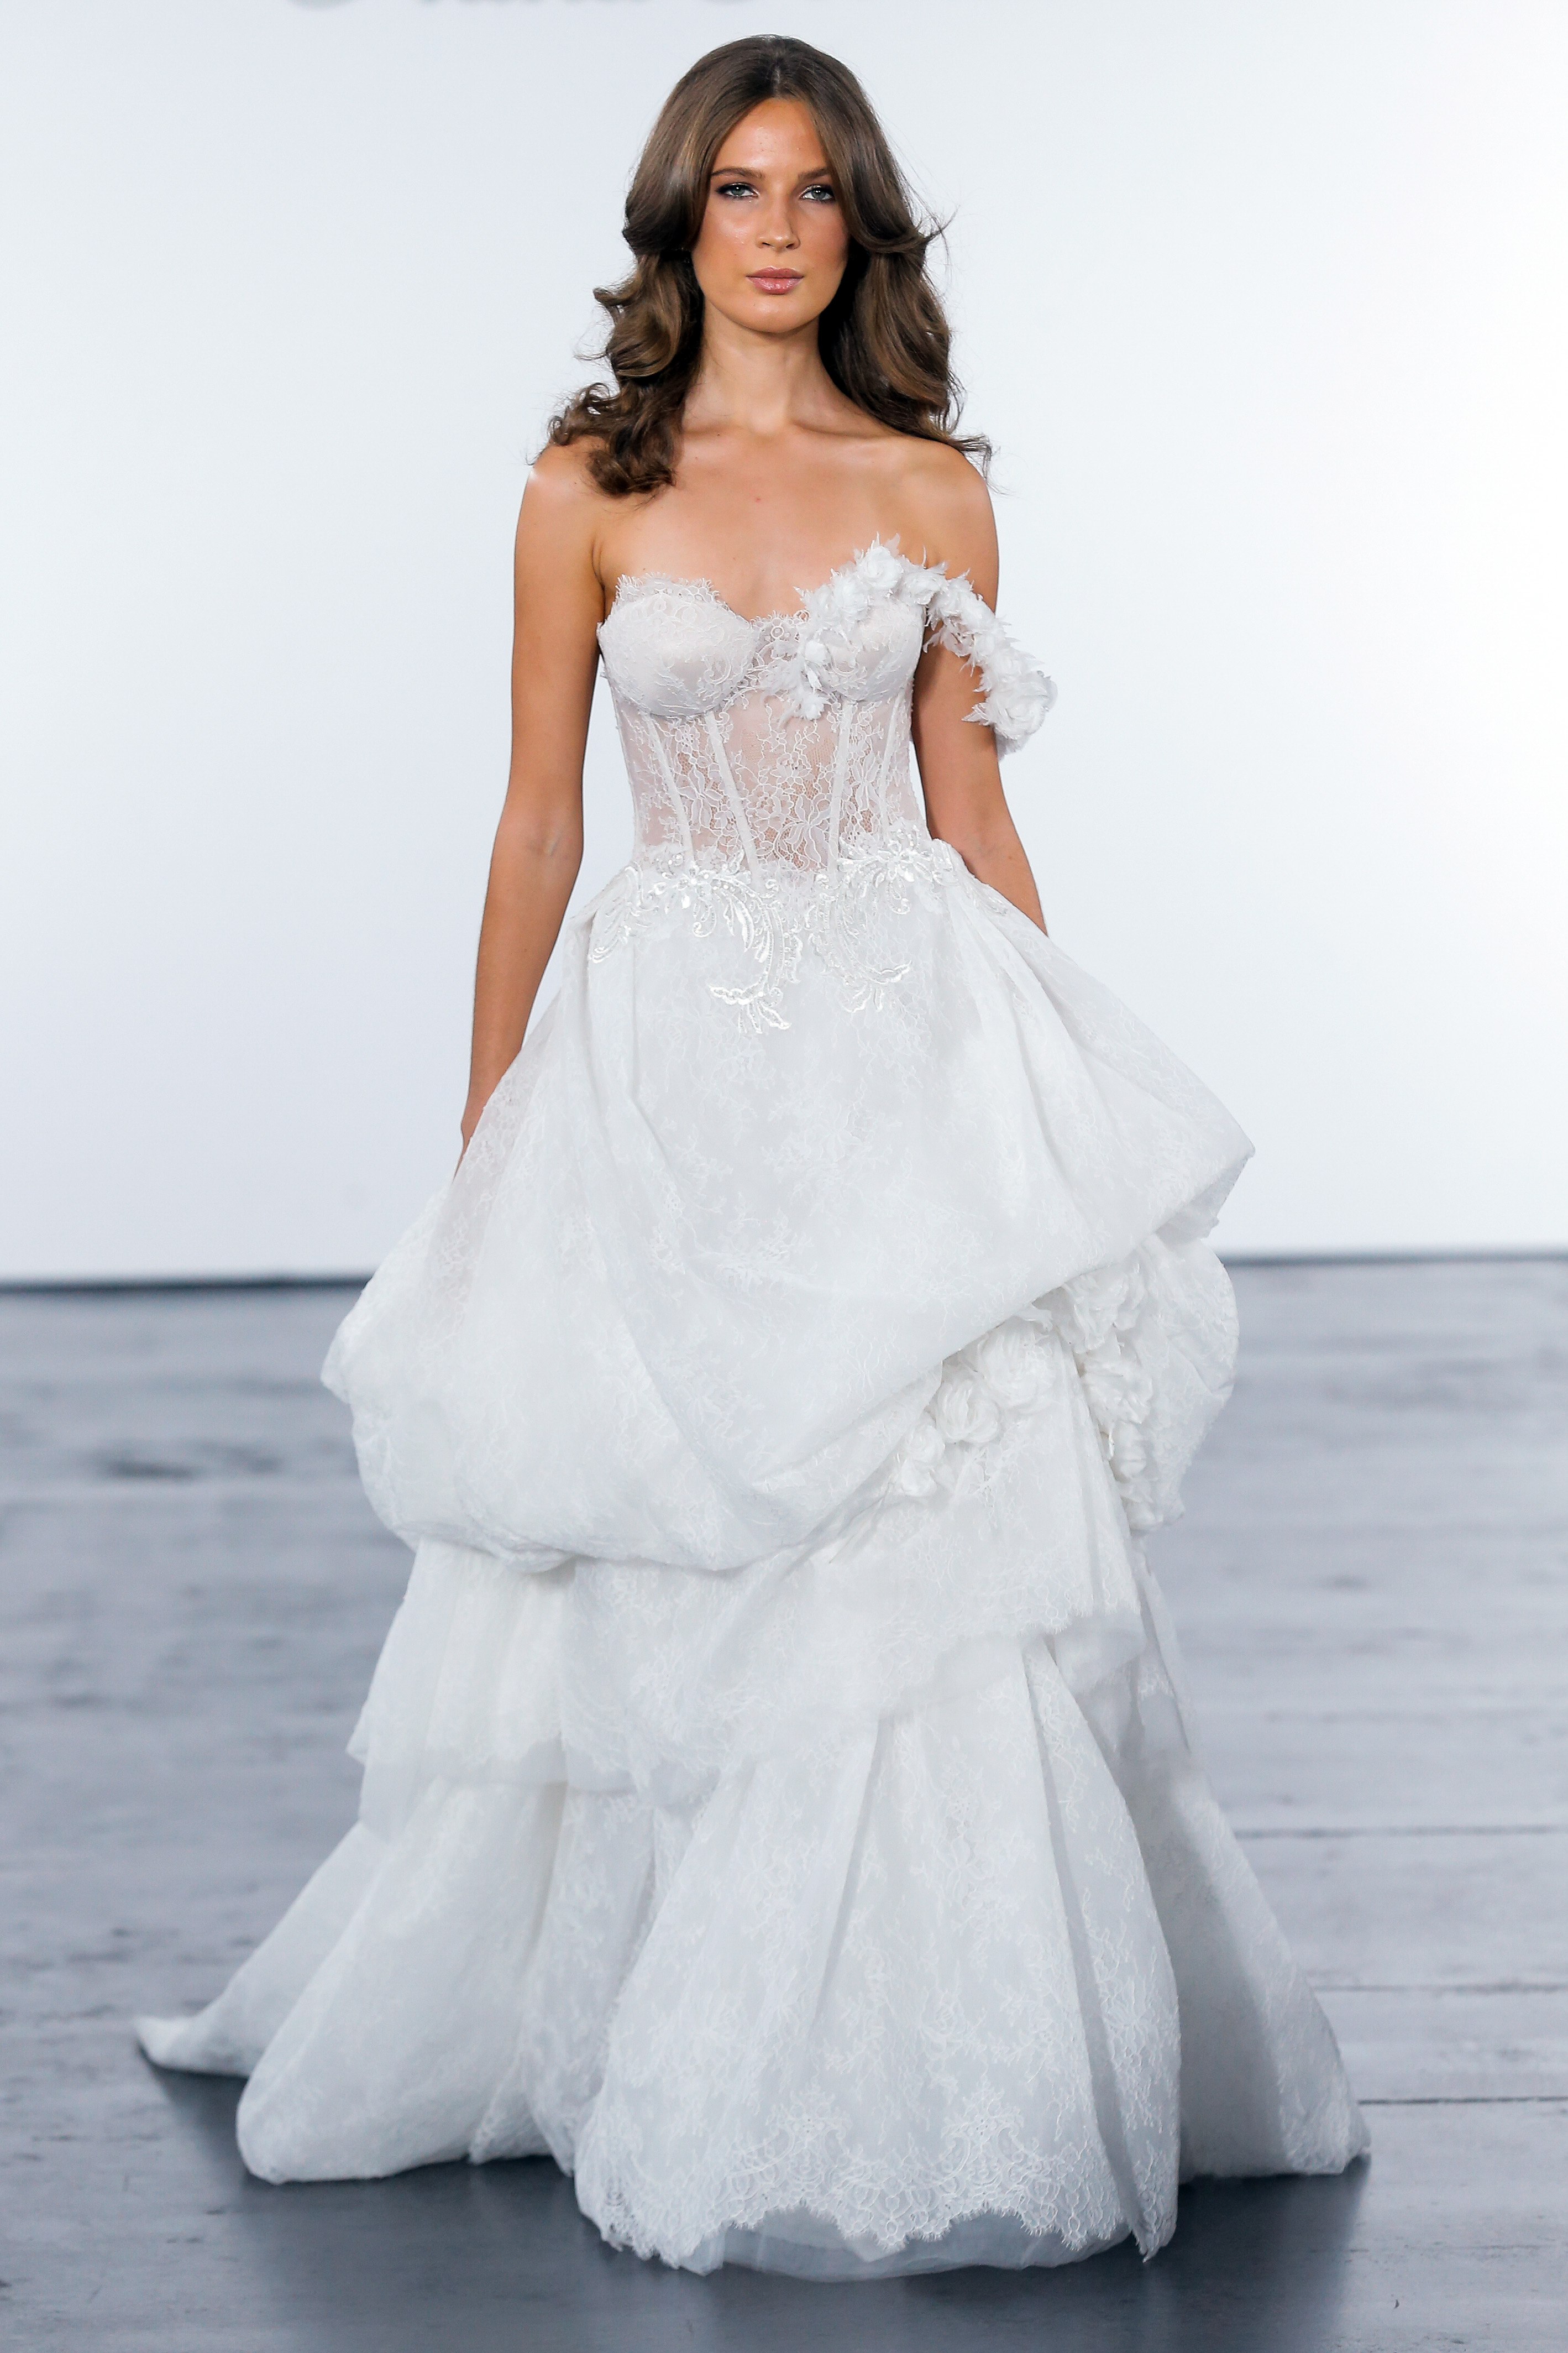 pnina tornai fall 2018 one strap corsetted wedding dress